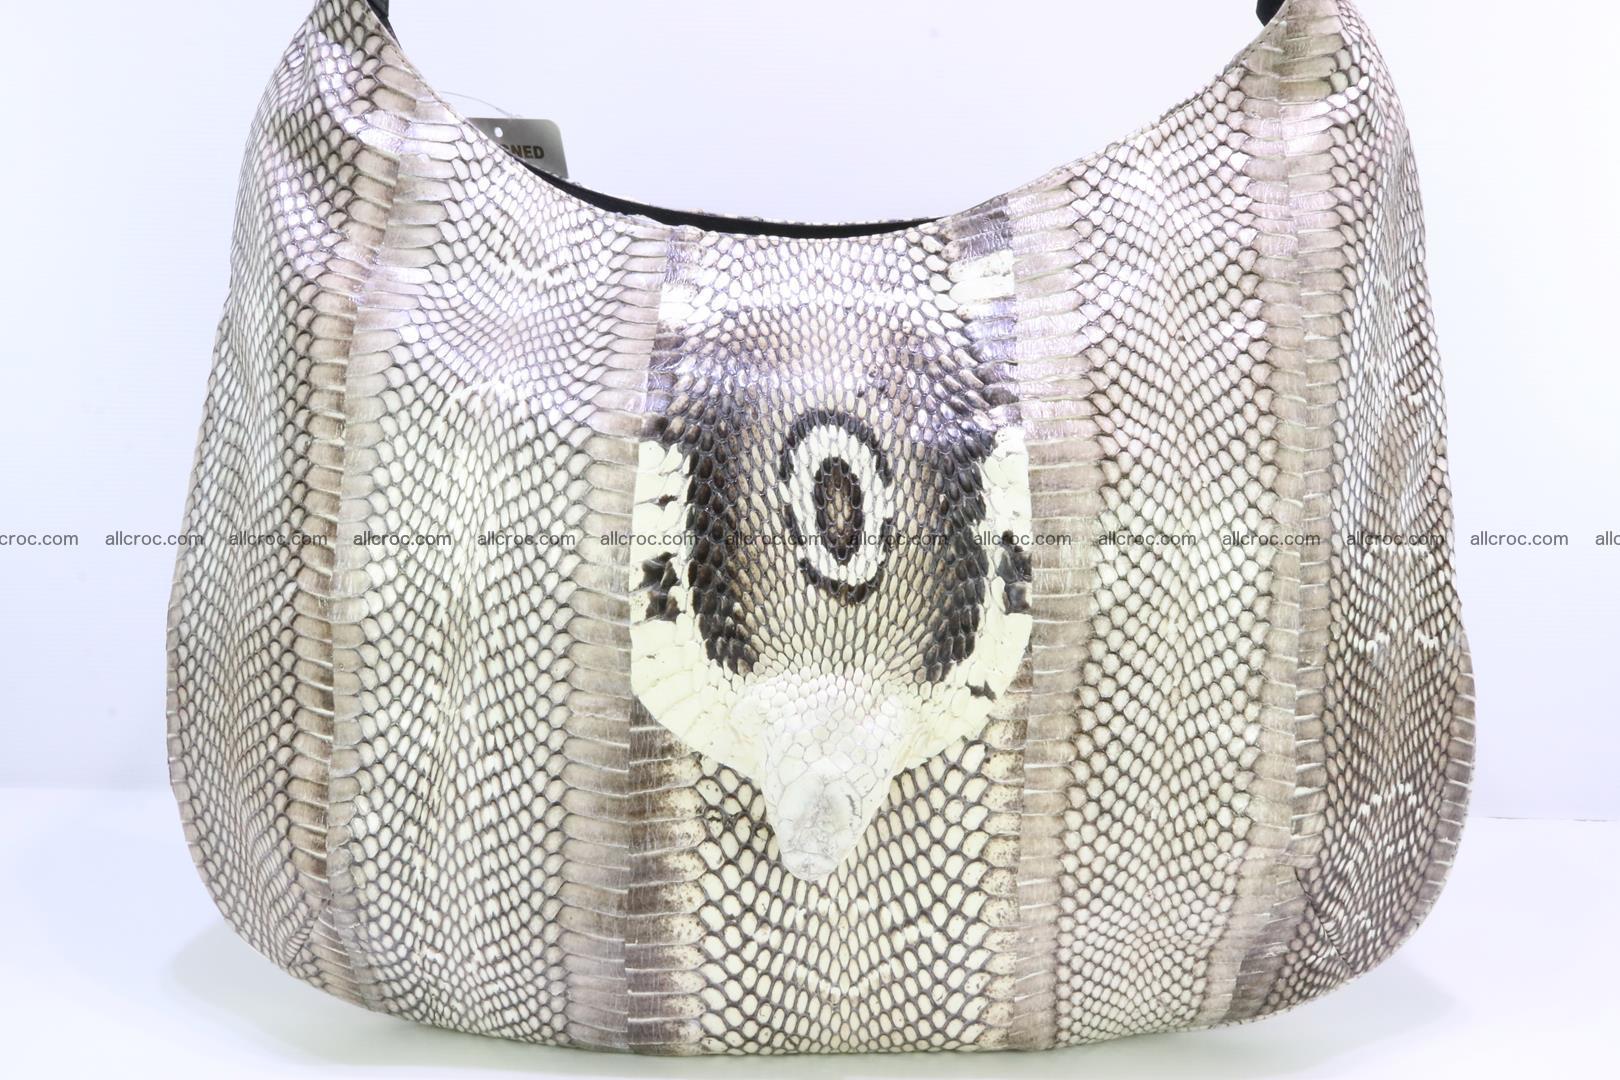 Cobra skin ladies handbag with head of cobra 194 Foto 2